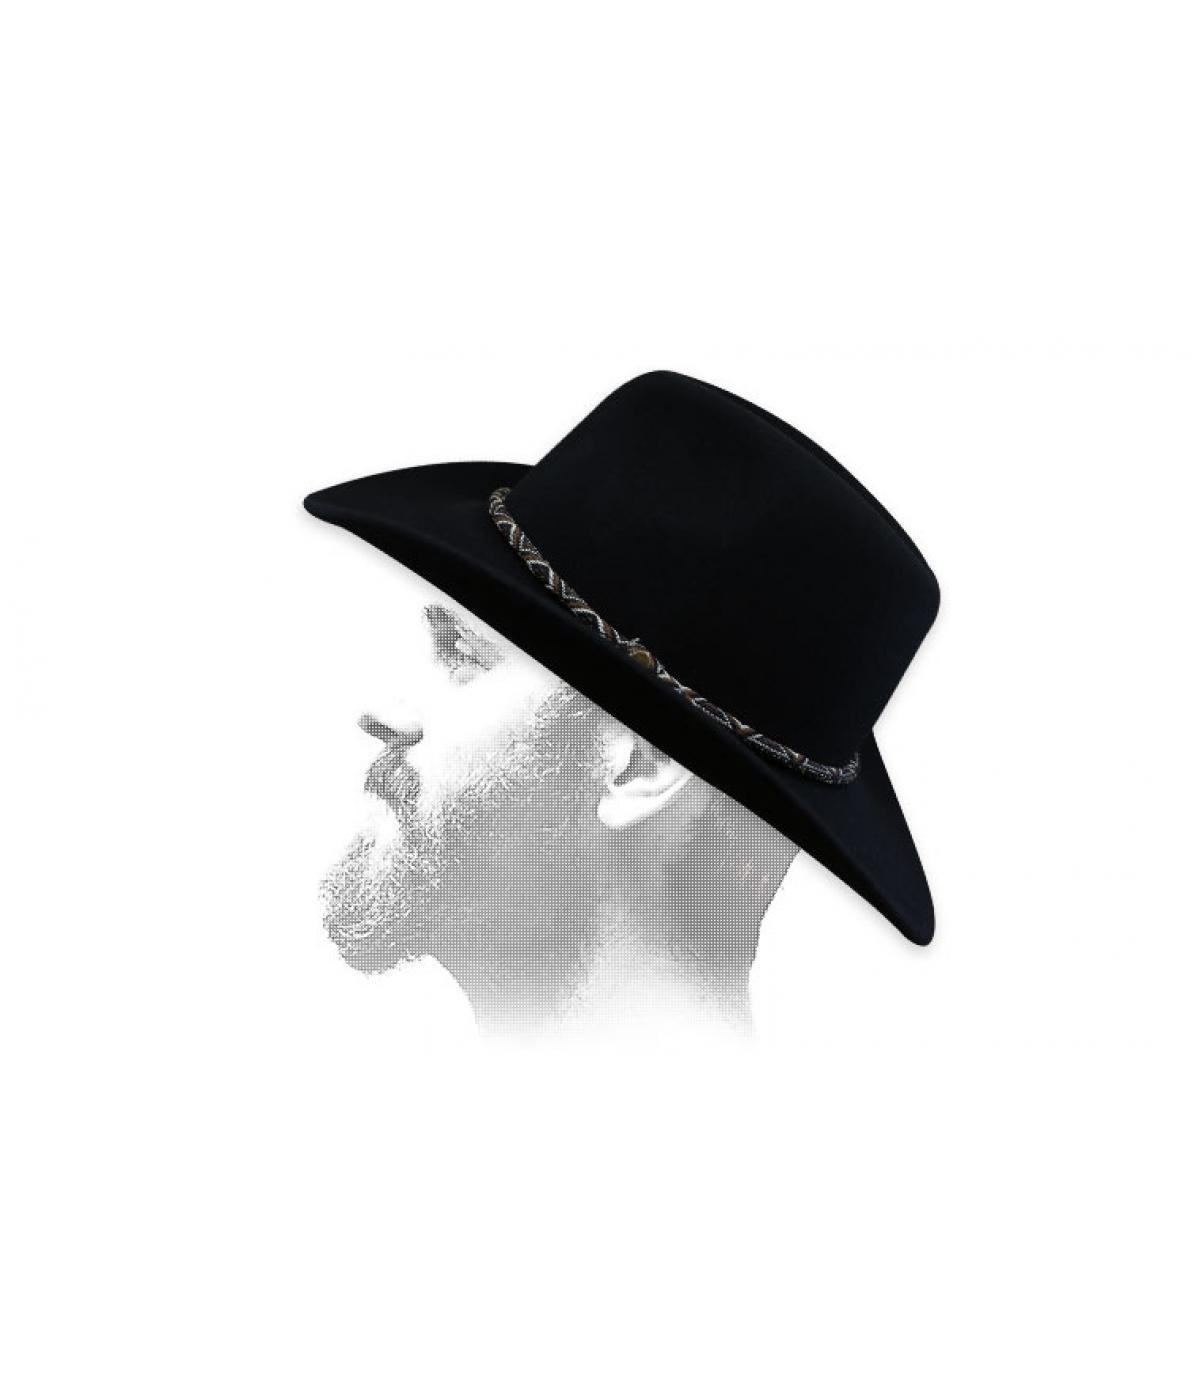 cappello da cowboy in feltro beige